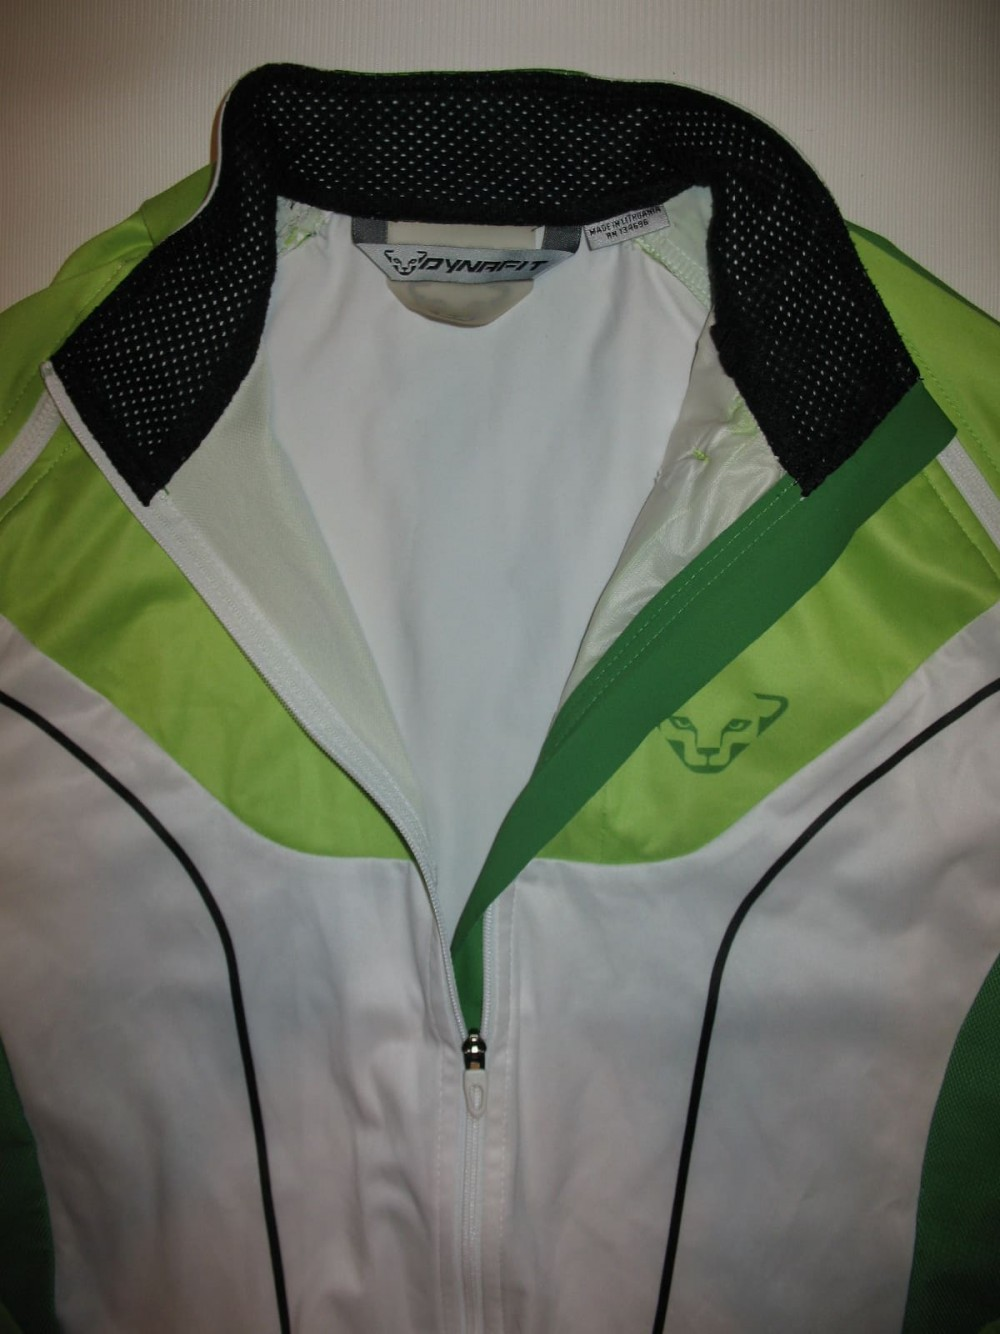 Велокуртка DYNAFIT transalper 2in1 conver bike/run jacket lady (размер M/S) - 5